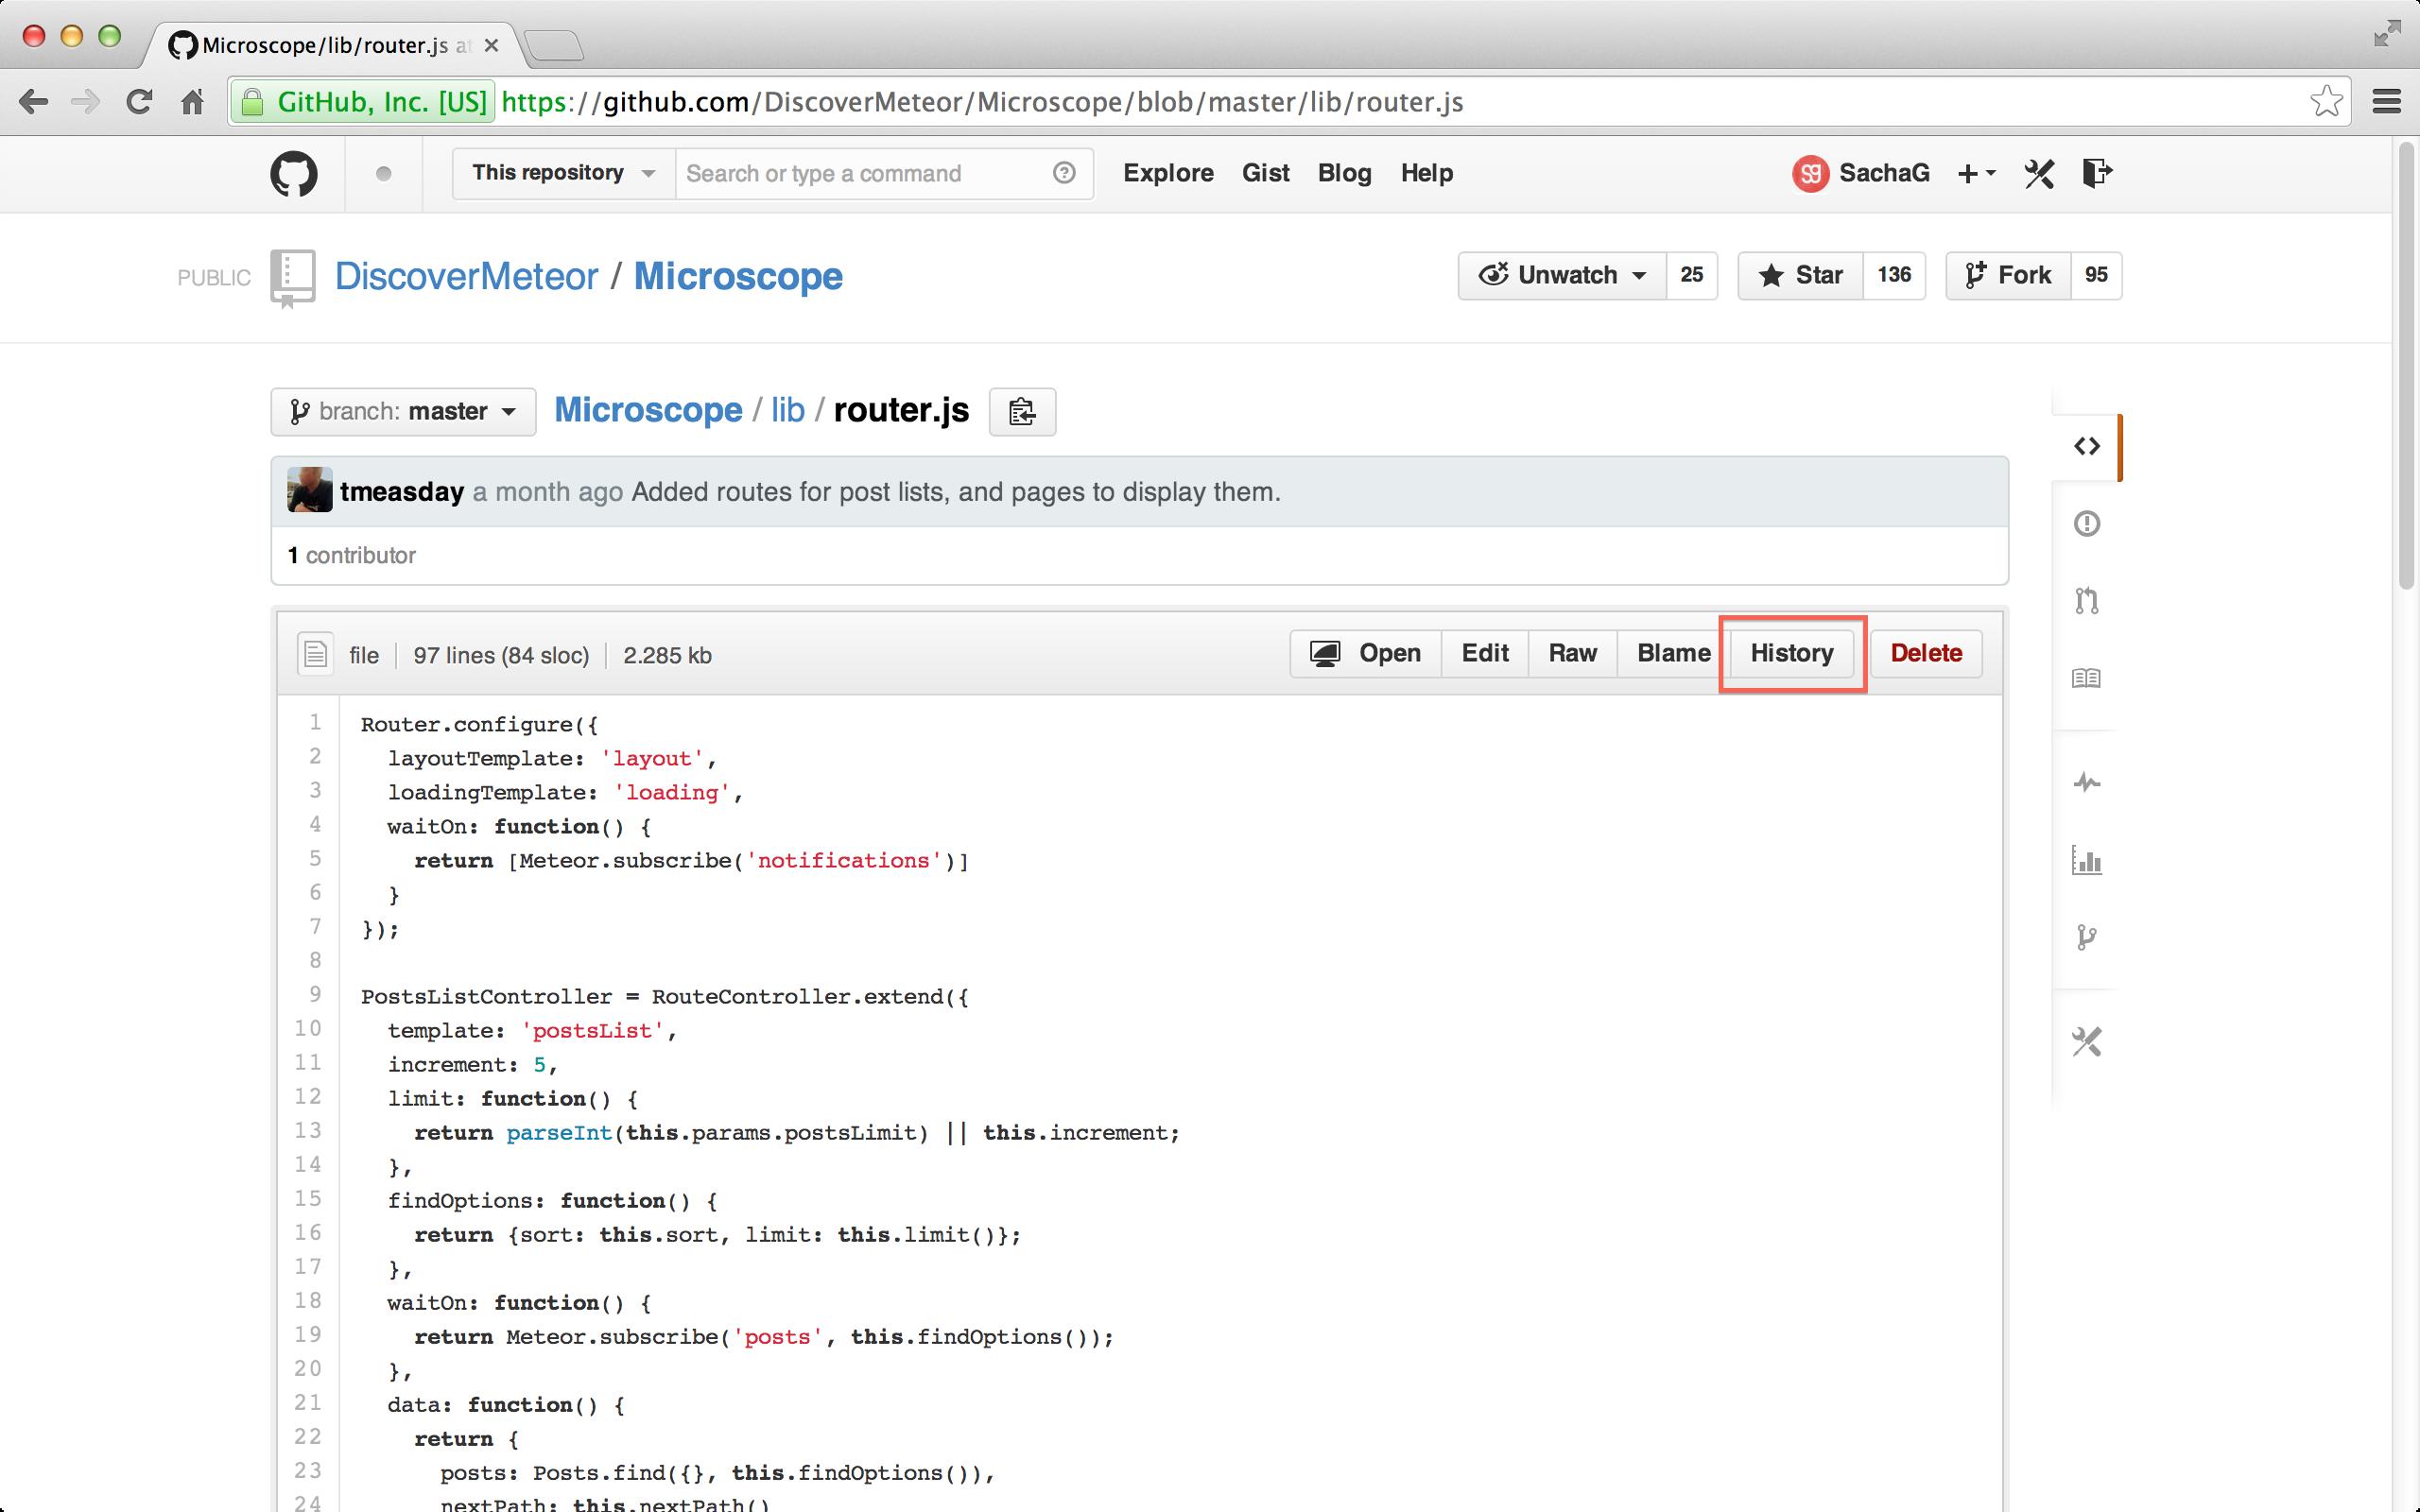 GitHub's History button